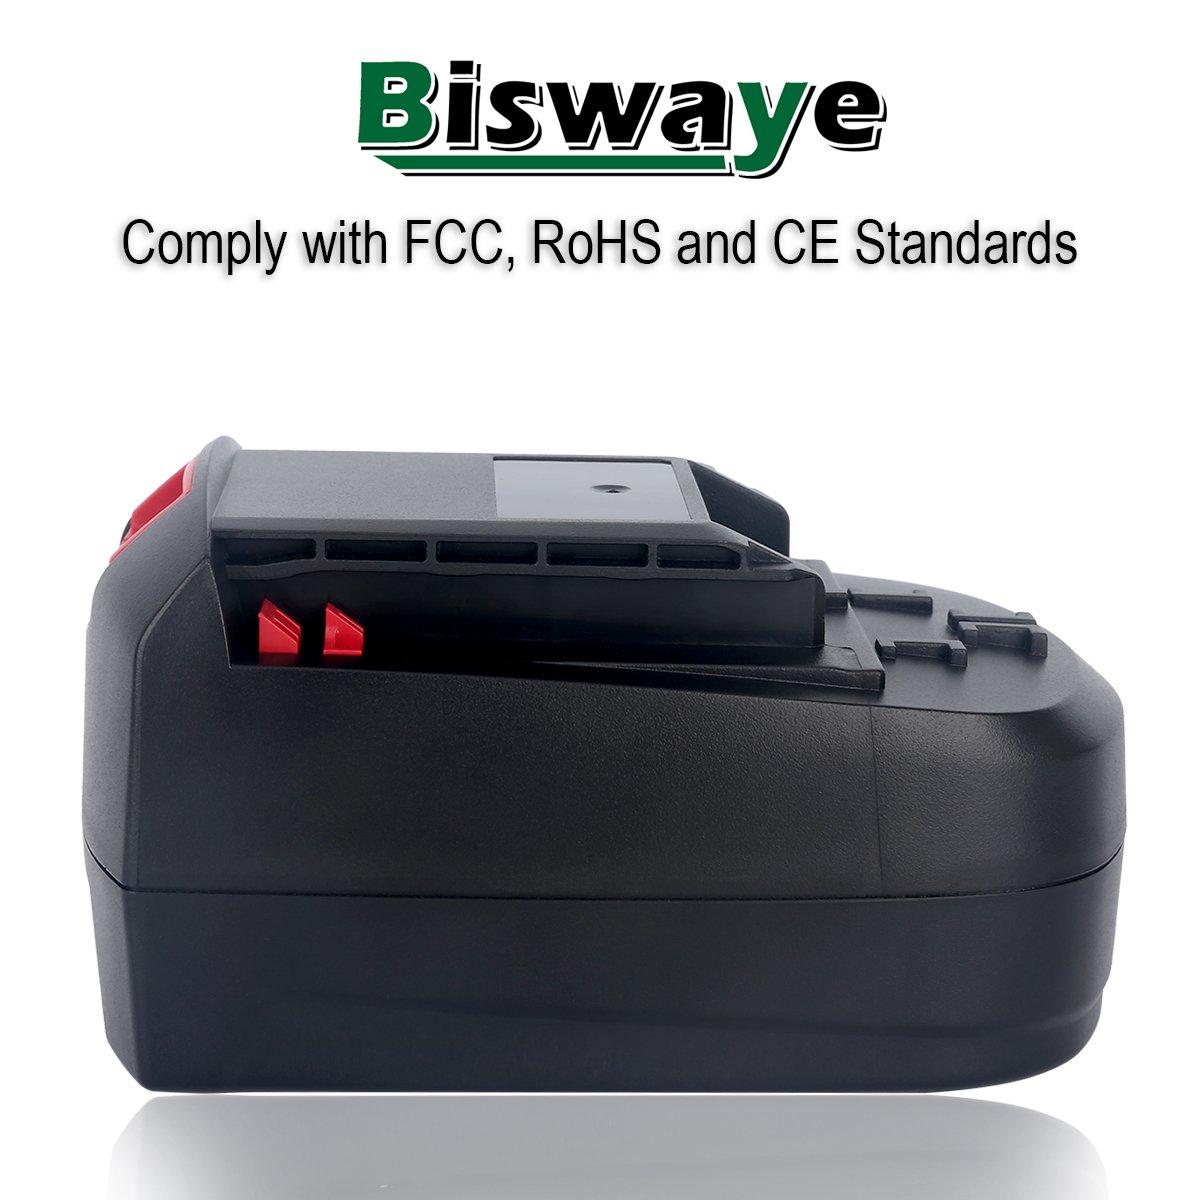 Biswaye 2Pack 18V Battery SB18C SB18A SB18B for Skil 18V Select System Cordless Tools 2810 2888 2895 2897 2898 4570 5850 5995 7305 9350, 3000mAh Ni-Cd by Biswaye (Image #5)